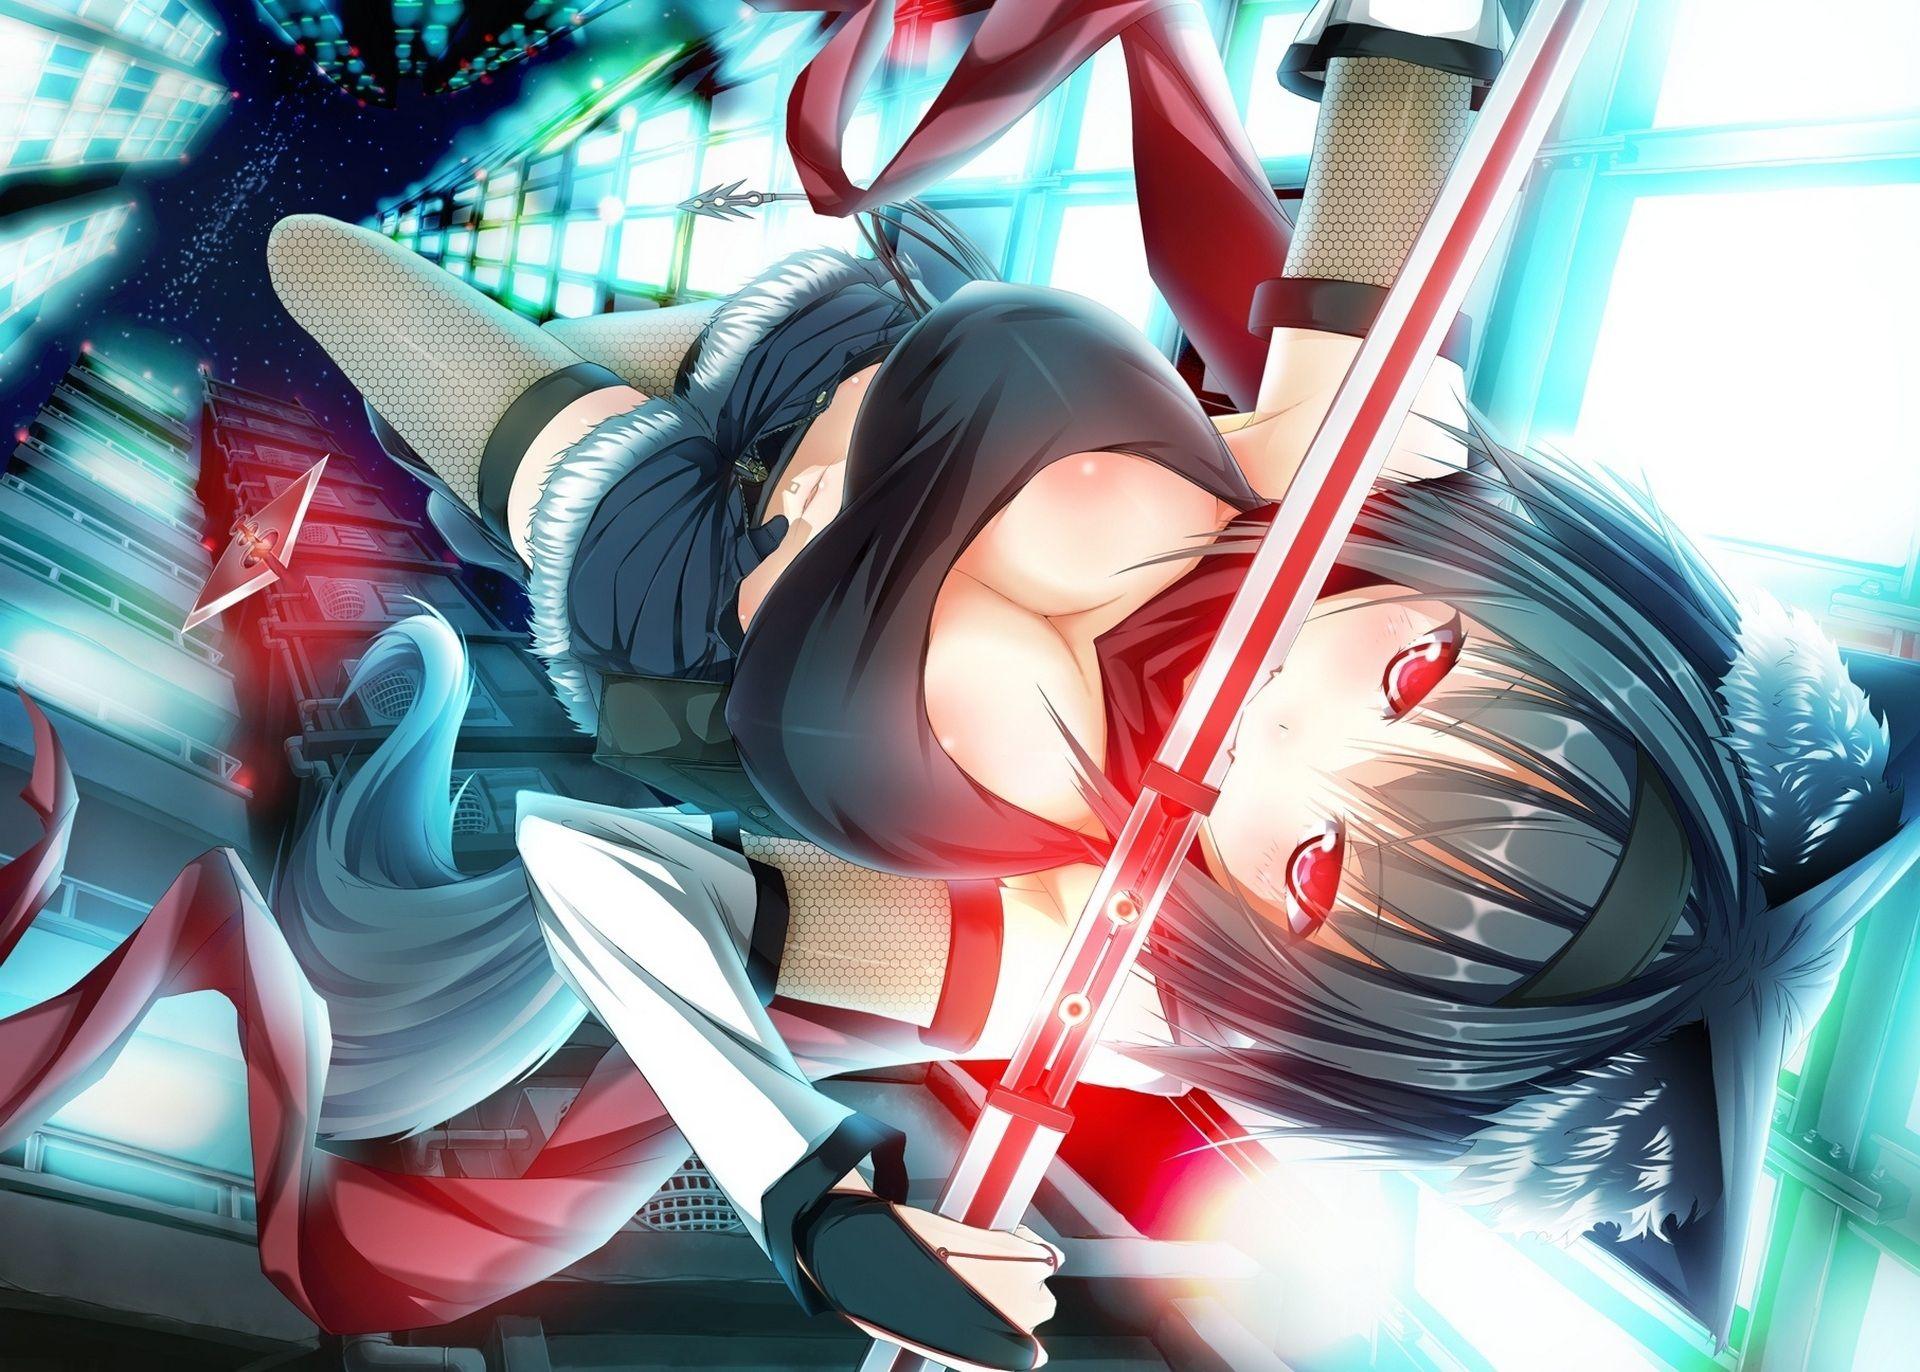 Ninja Girl Anime Wallpapers - Wallpaper ...